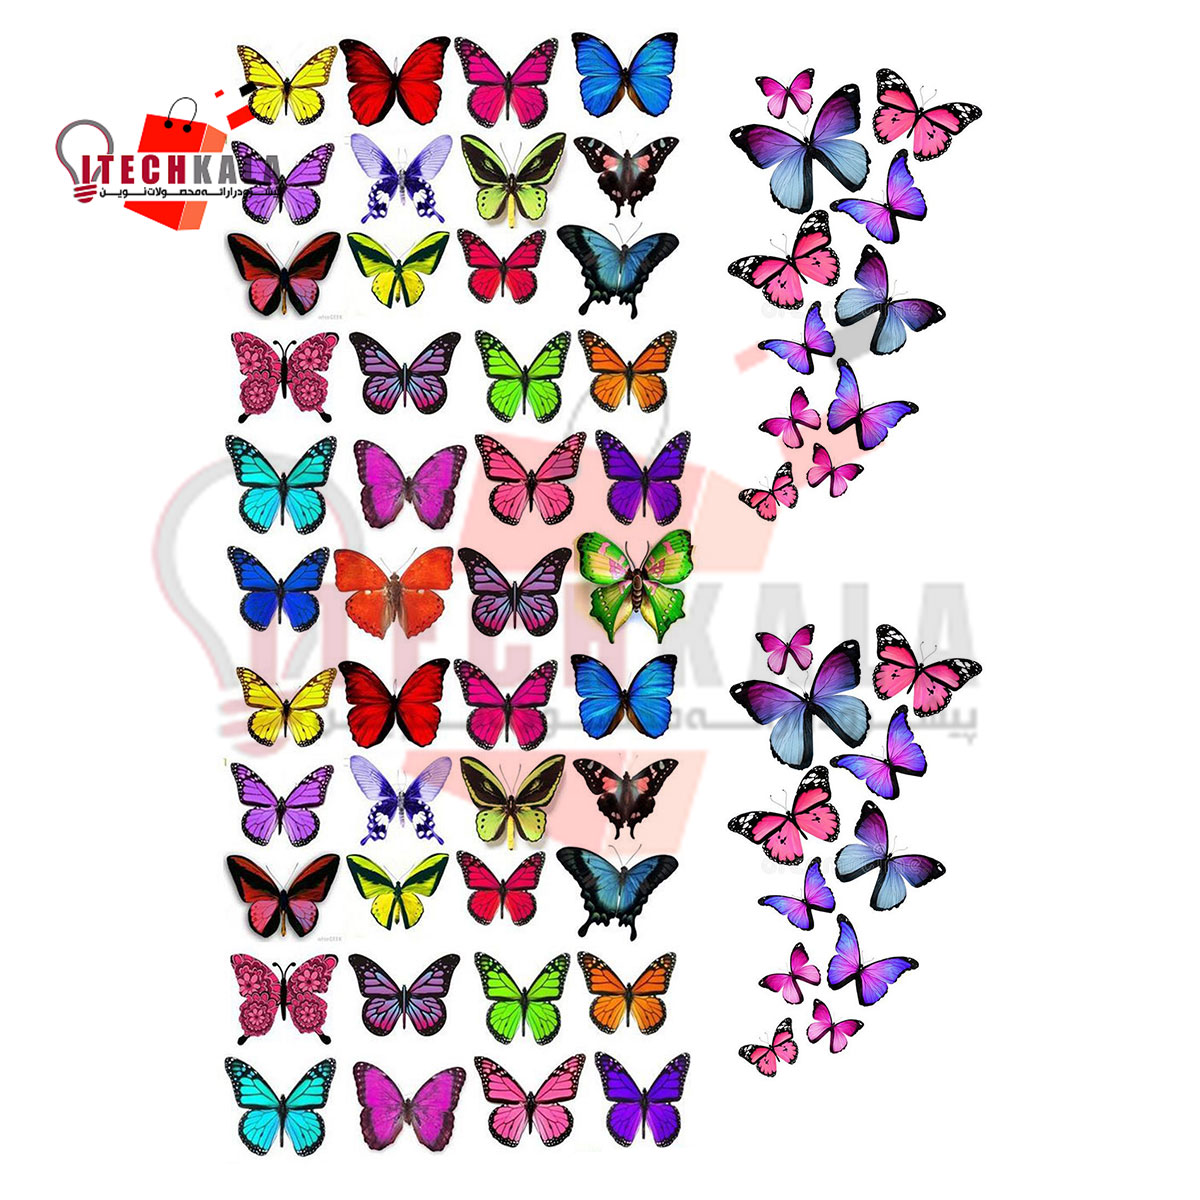 تصویر طلق ترنسپرنت رنگی (مدل پروانه سه بعدی)